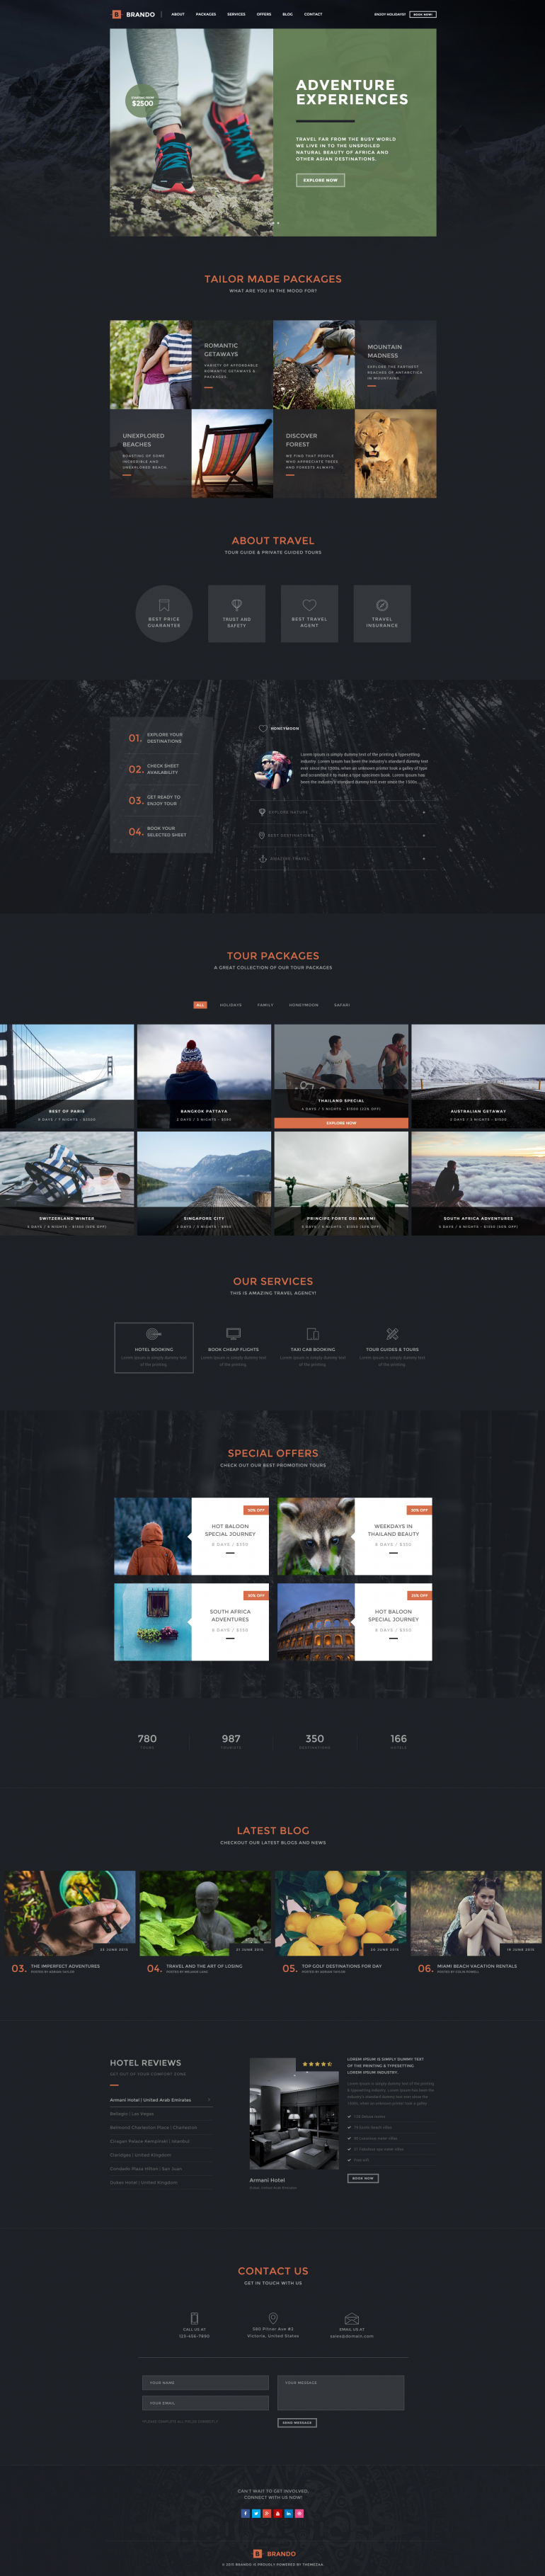 Brando Travel OnePage WordPress Theme